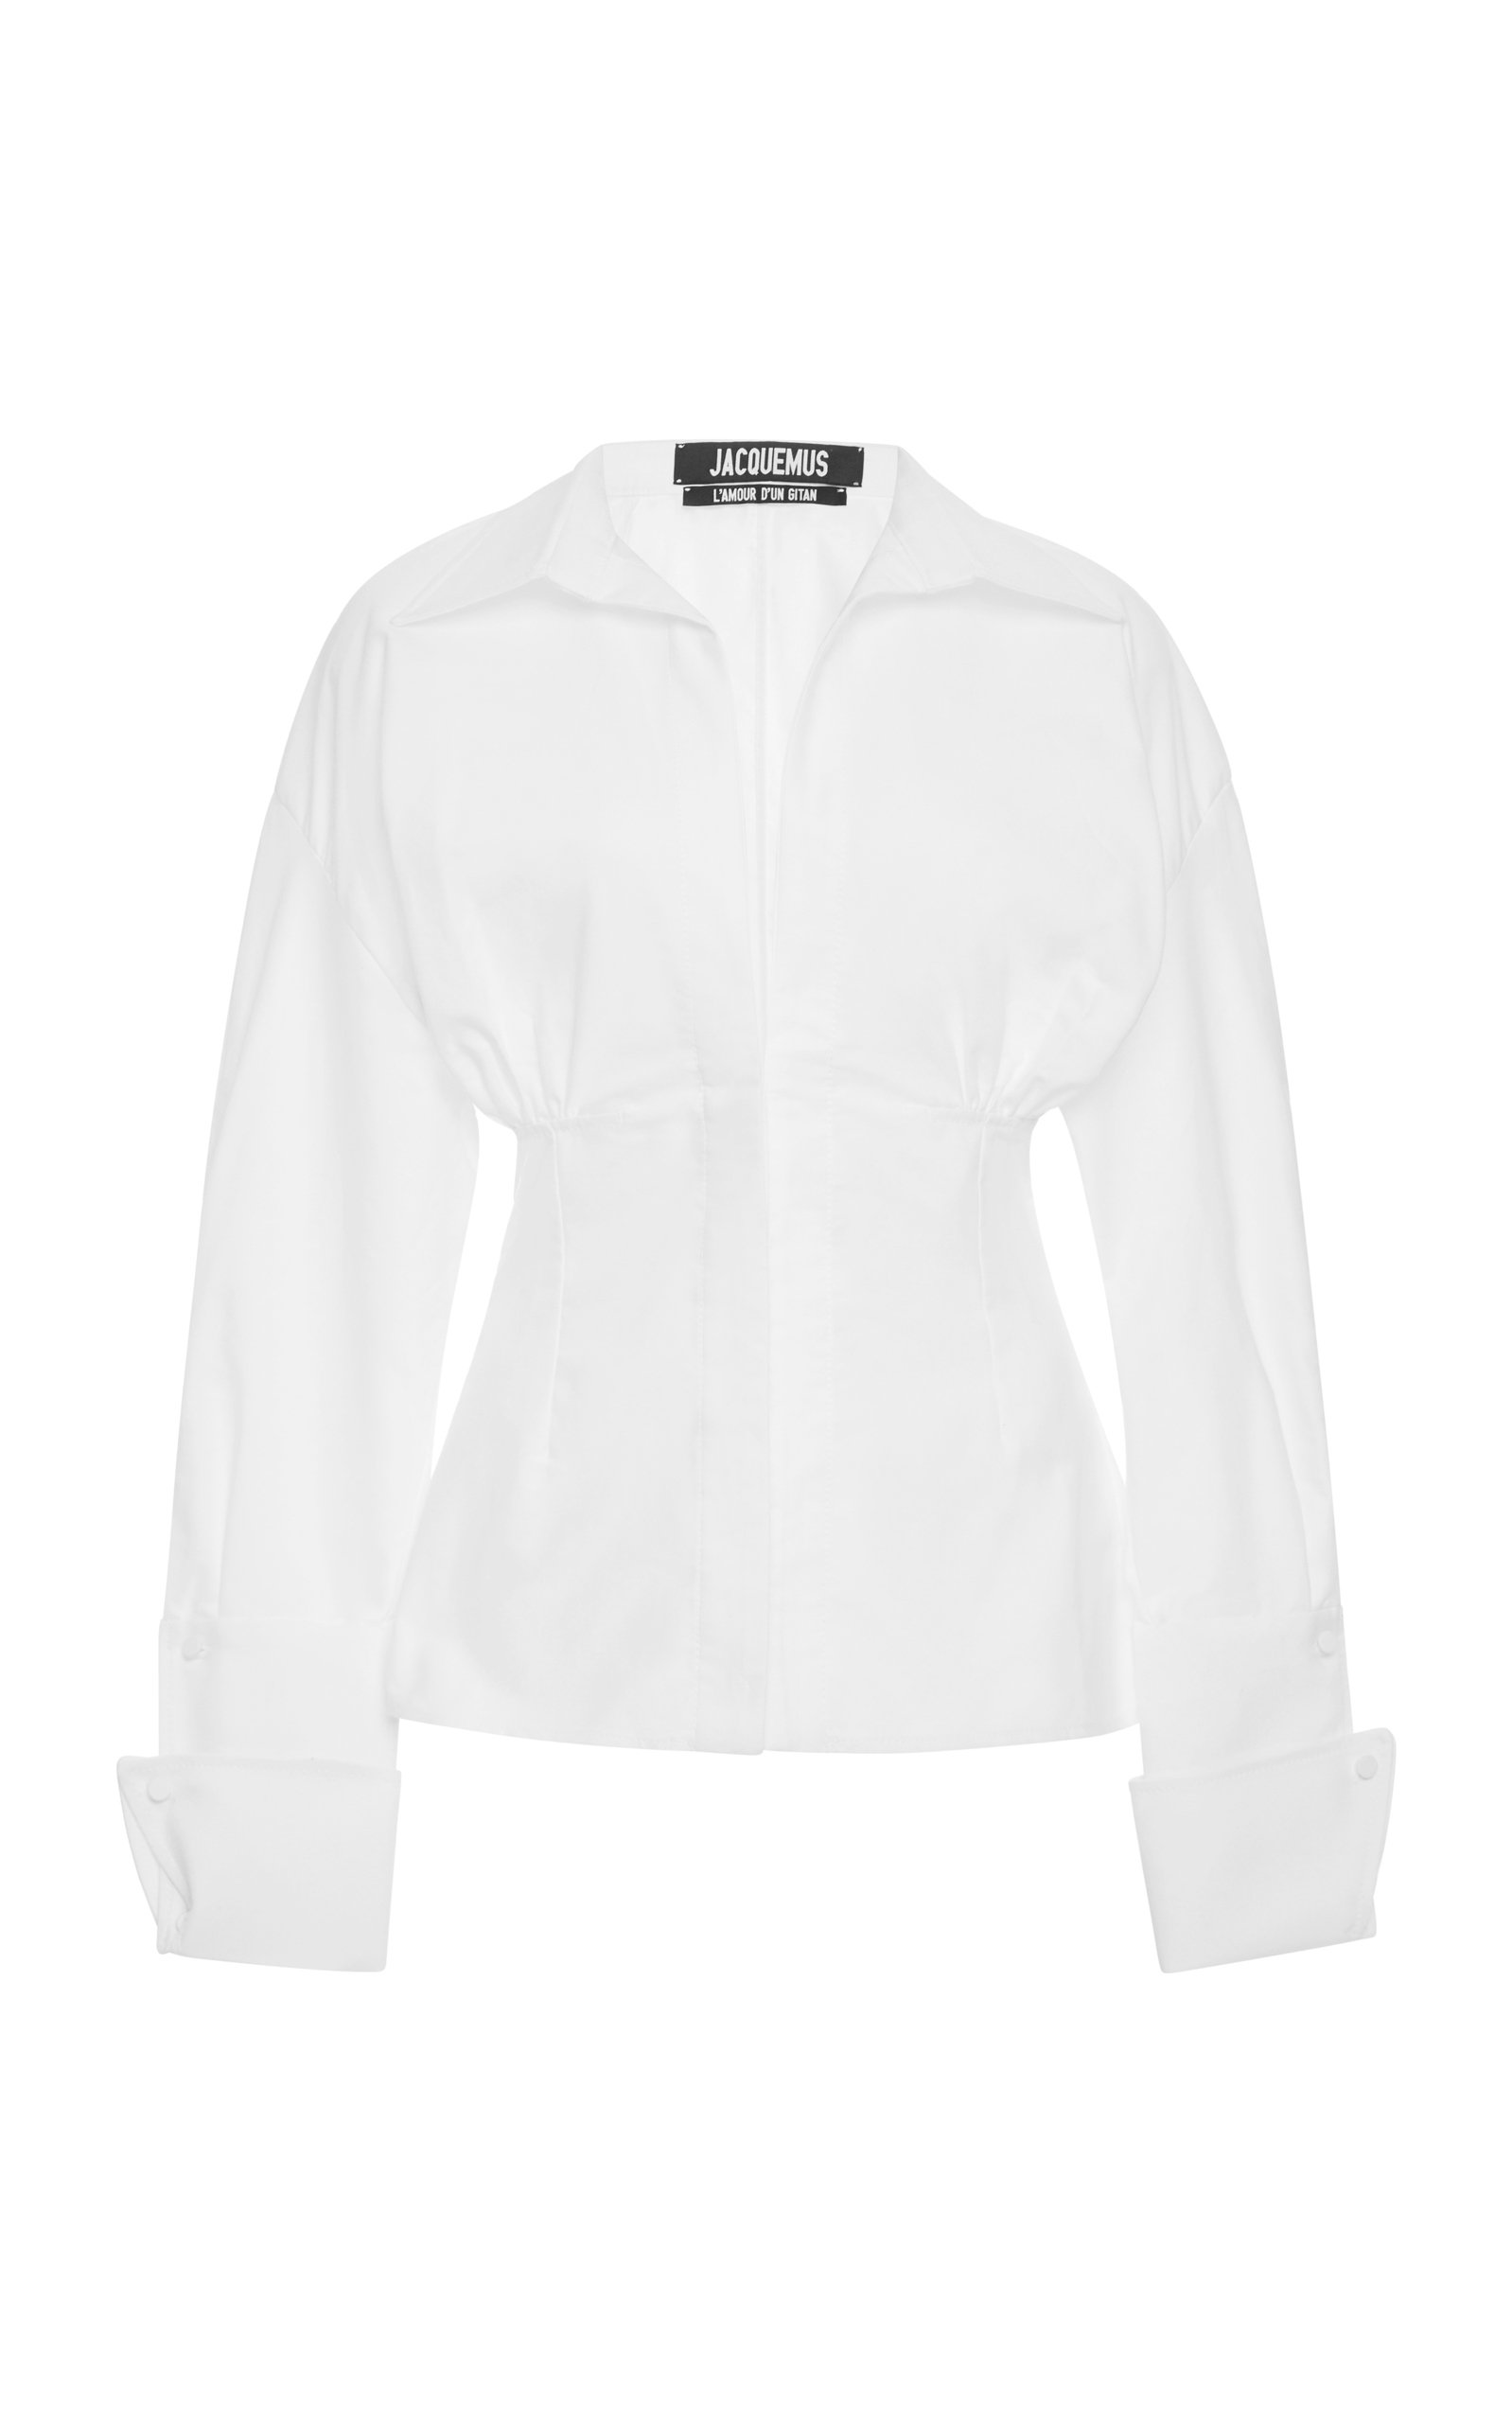 Jacquemus Puff Sleeve Cotton Shirt